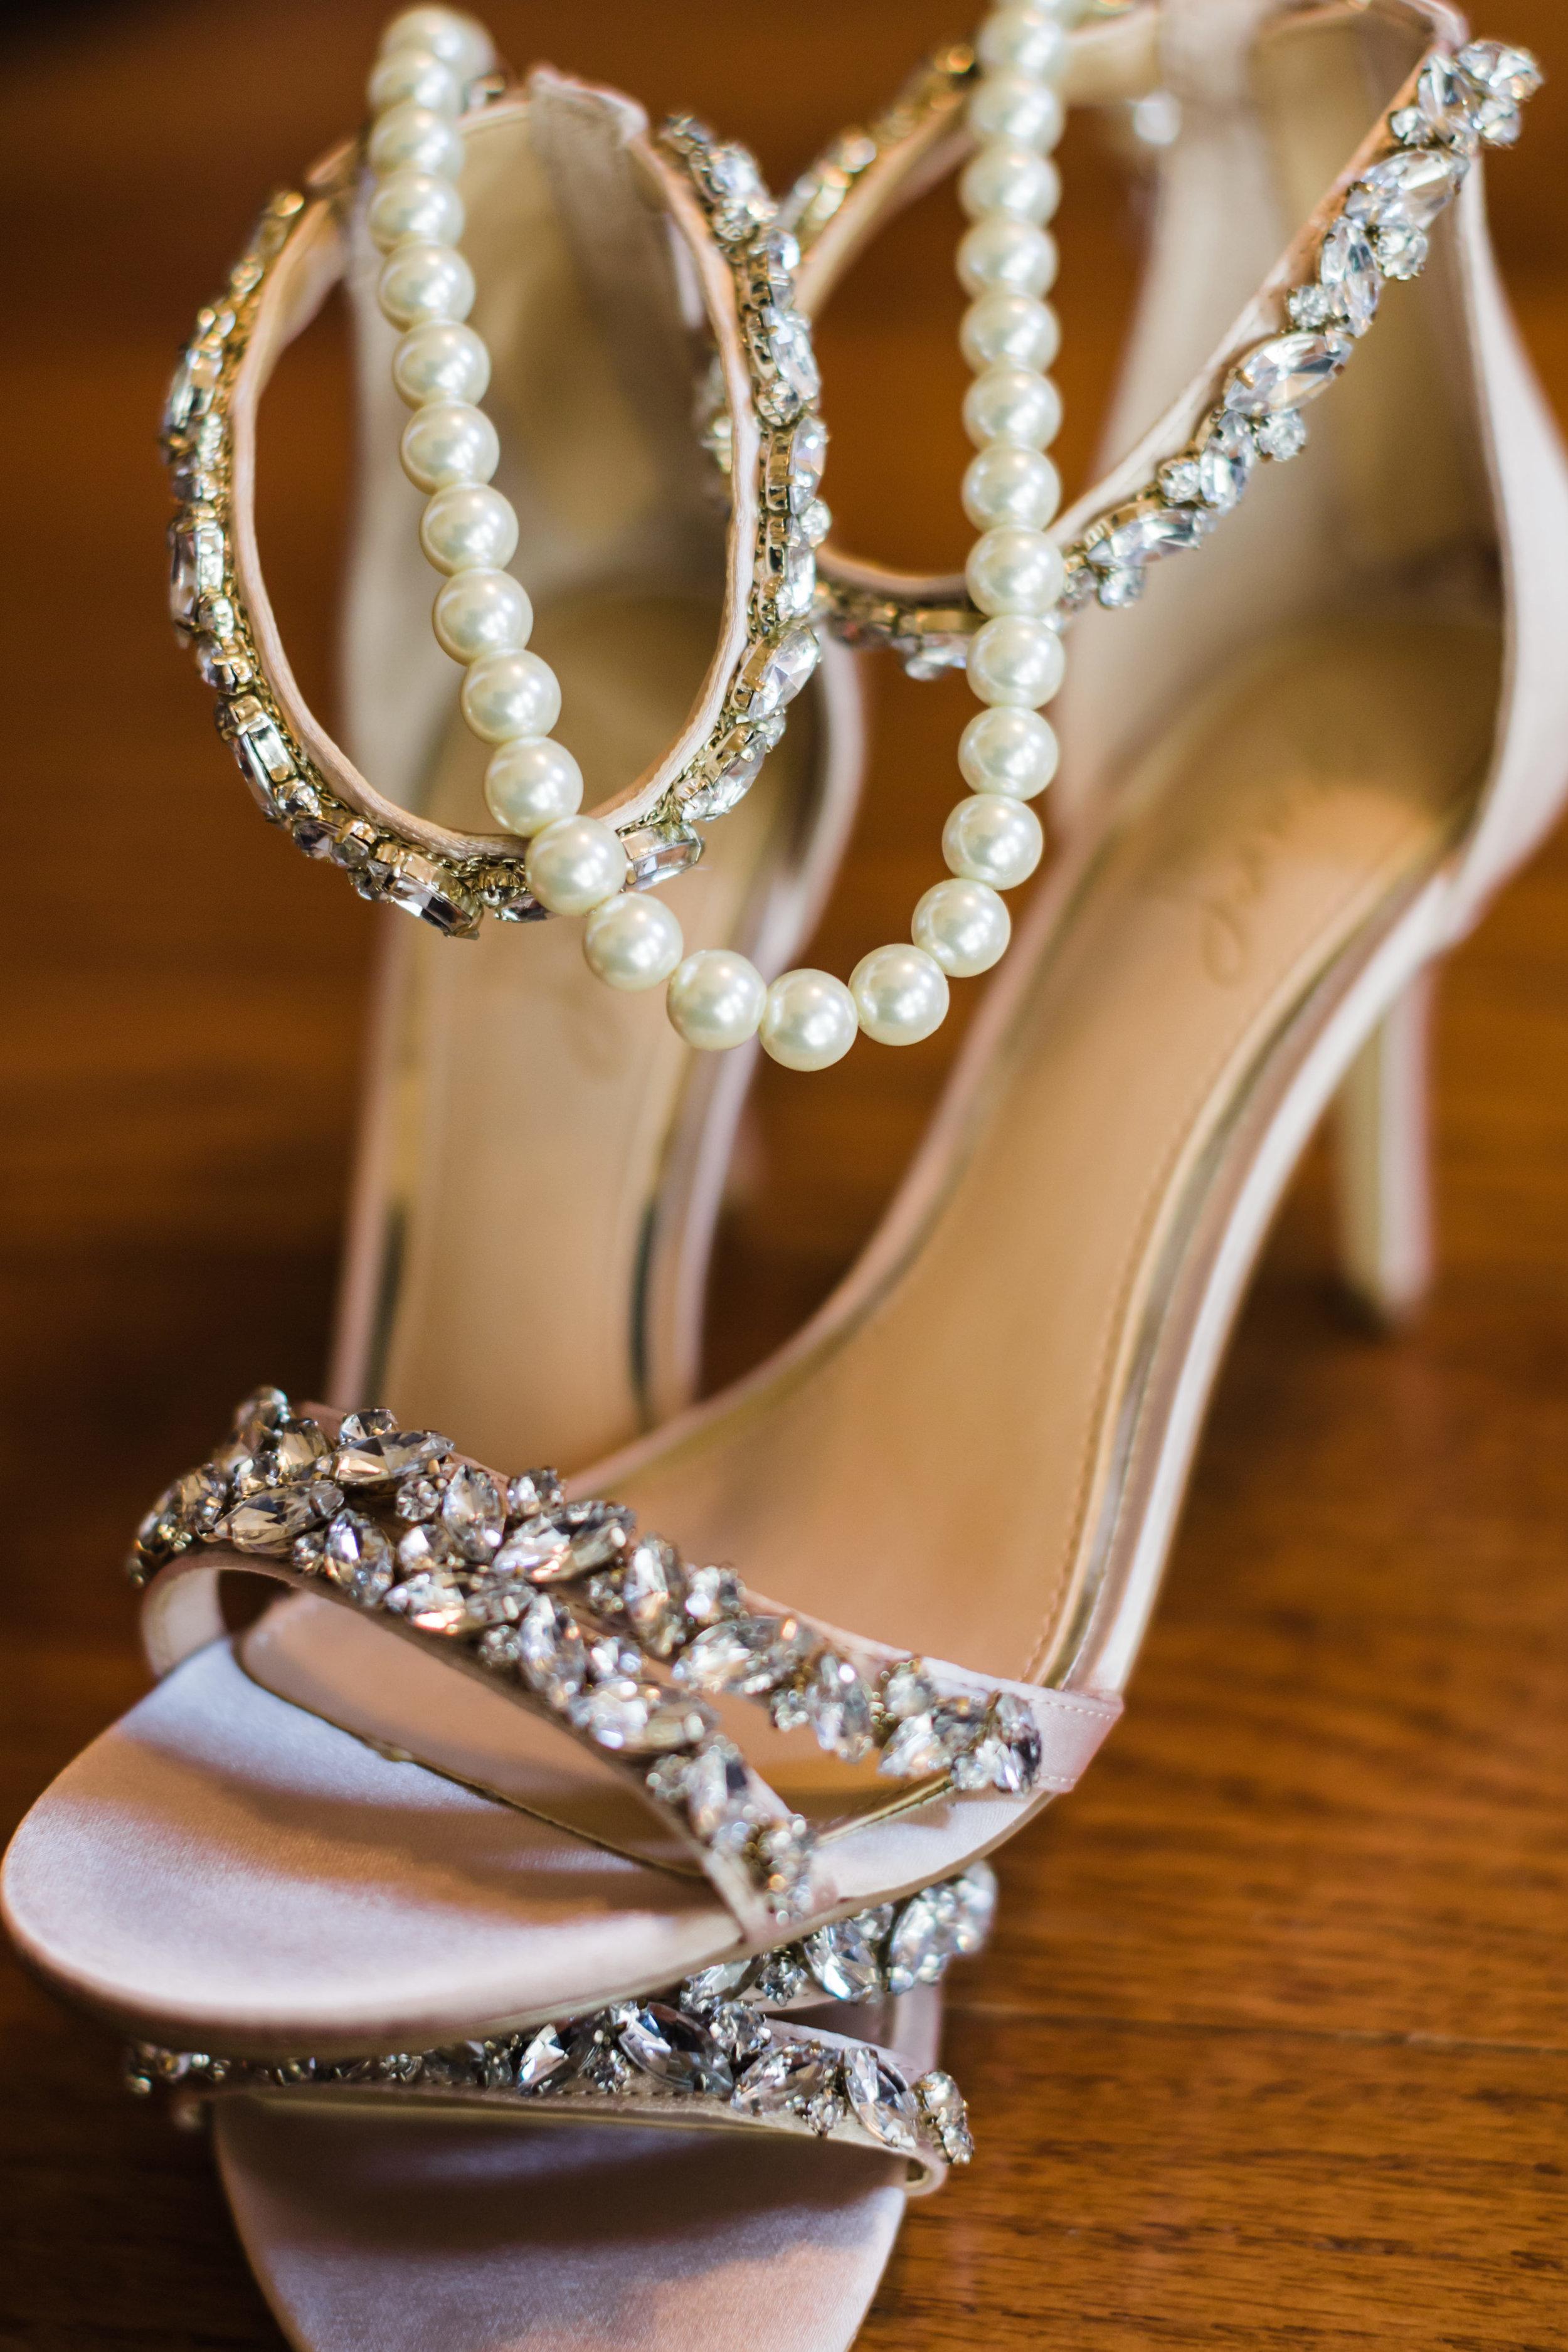 2018.11.03 Jael and Edel Ocala Wedding FINALS (76 of 441).jpg